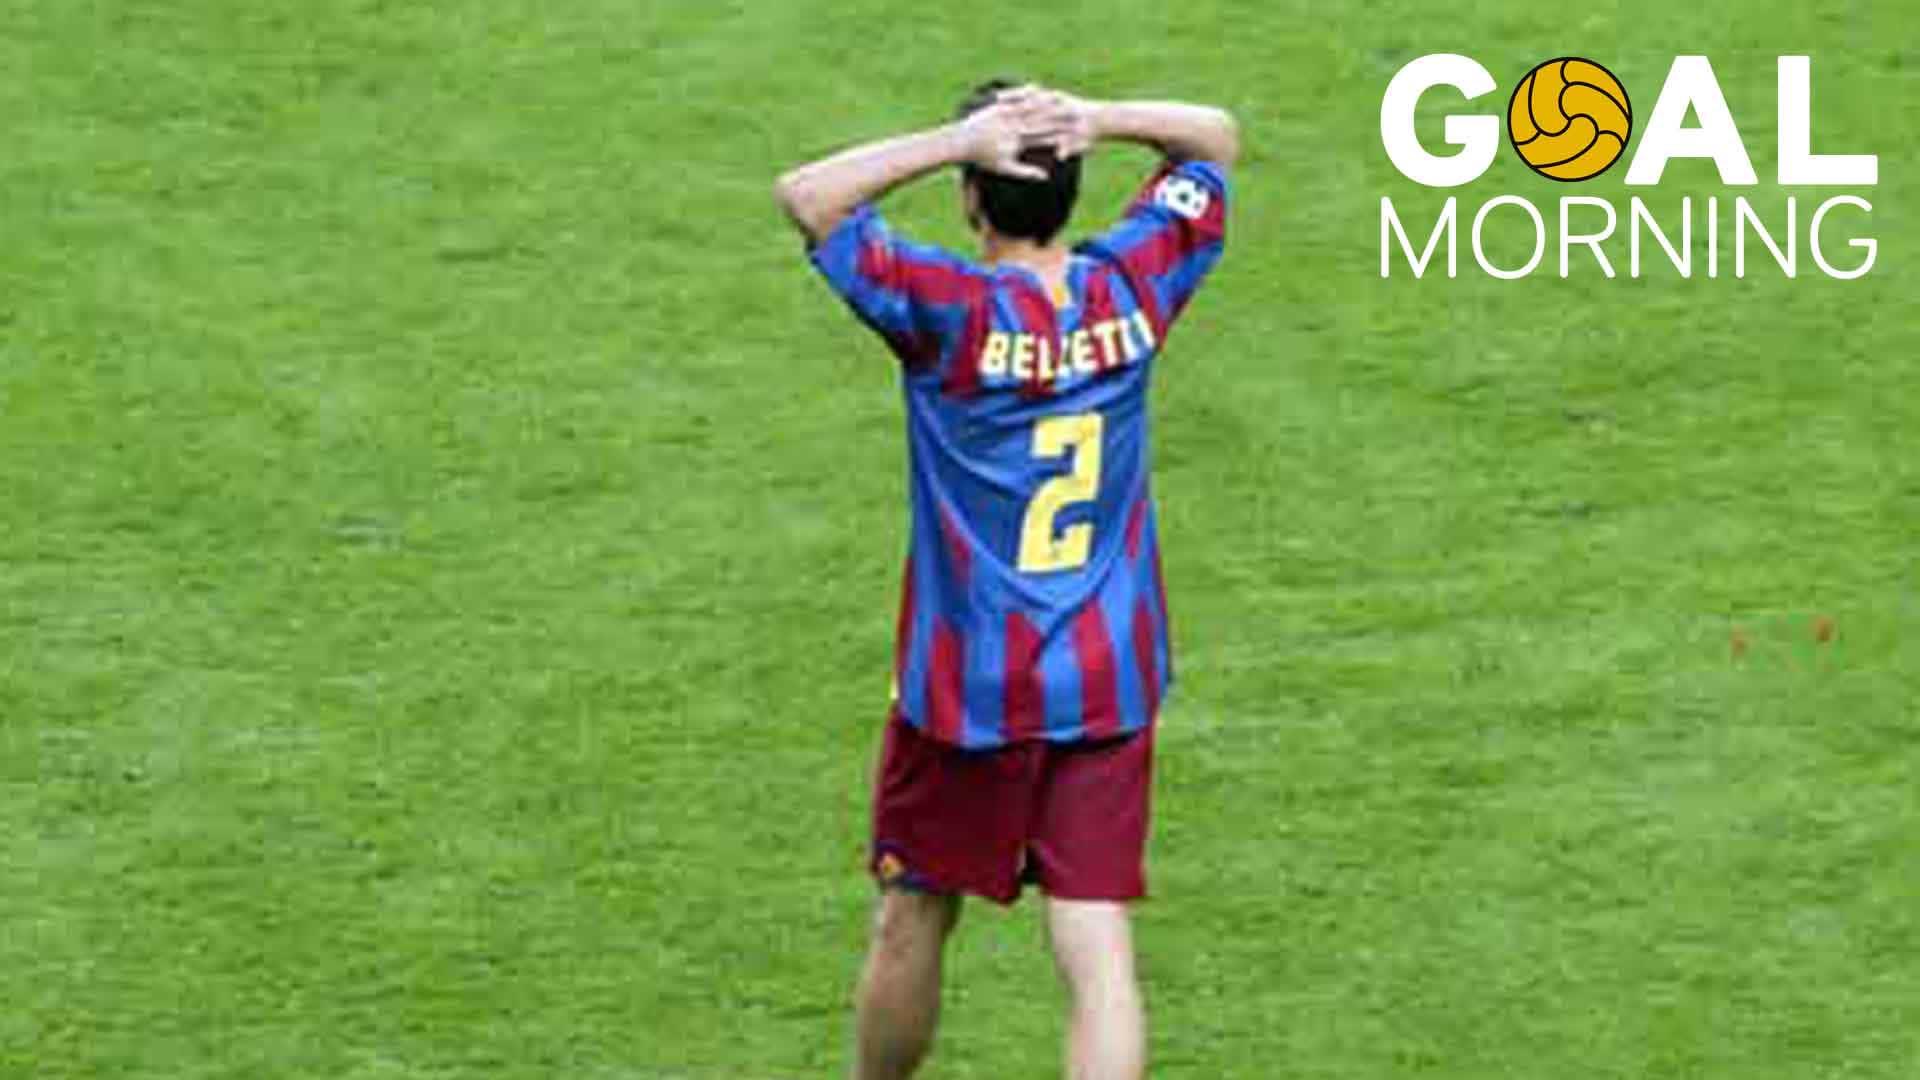 G⚽️AL MORNING!!! ¡Hace 12 años ganábamos la Liga de Campeones! �� @julianobelletti ��   �� Arsenal �� 2006 https://t.co/cl6HqX9Svq